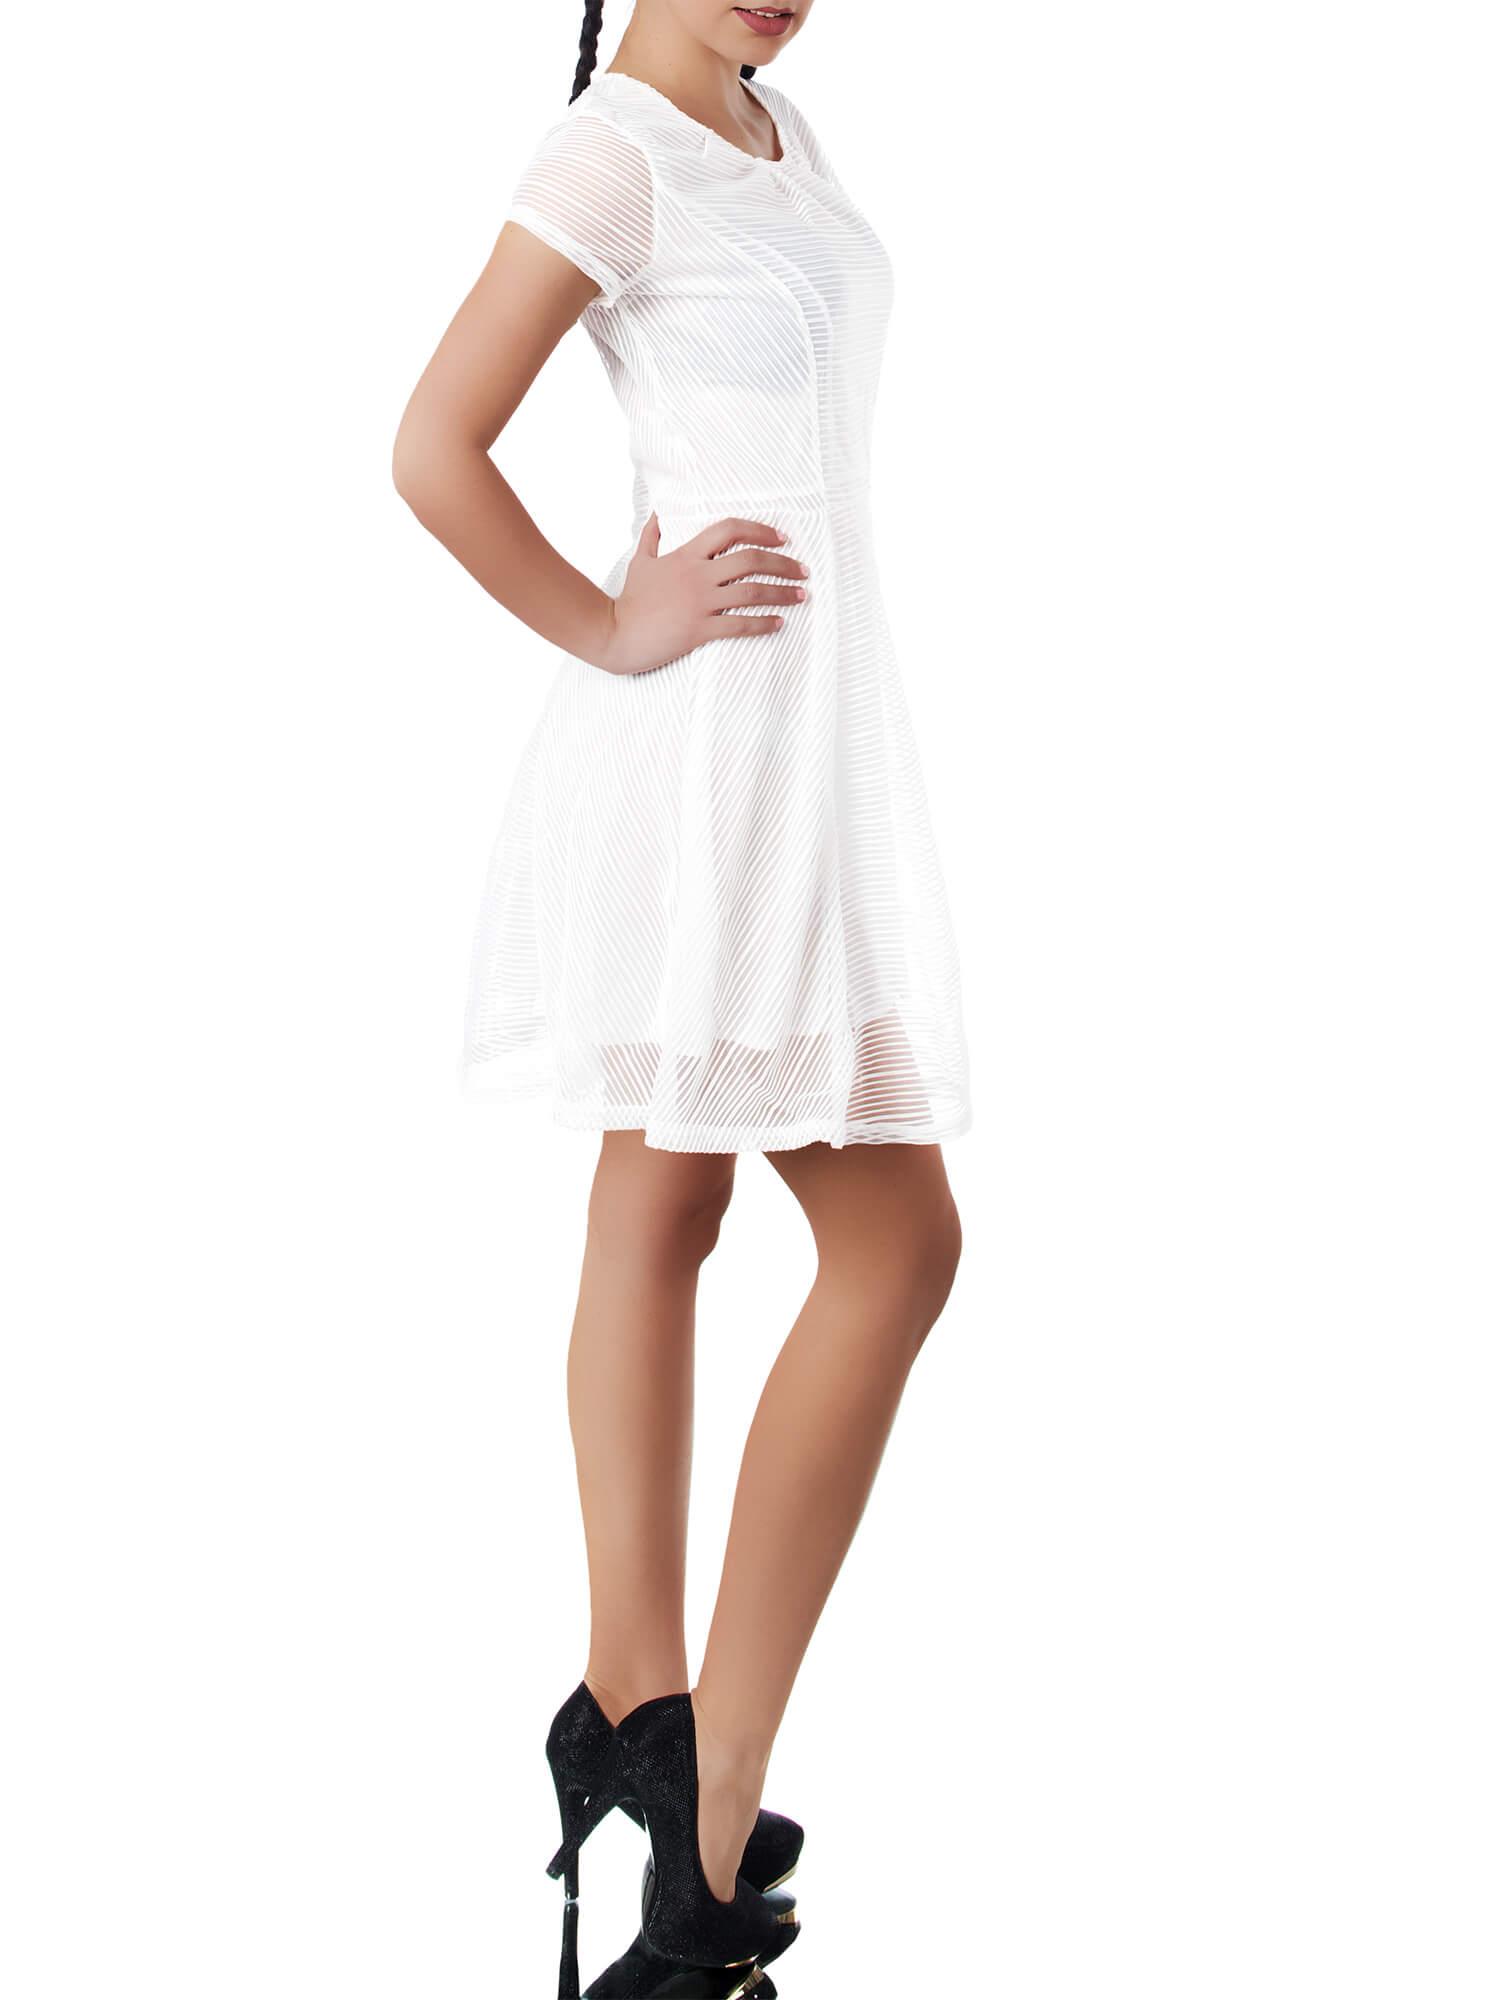 Sexi krátke šaty 2 varianty 9392  20c0da2c85f